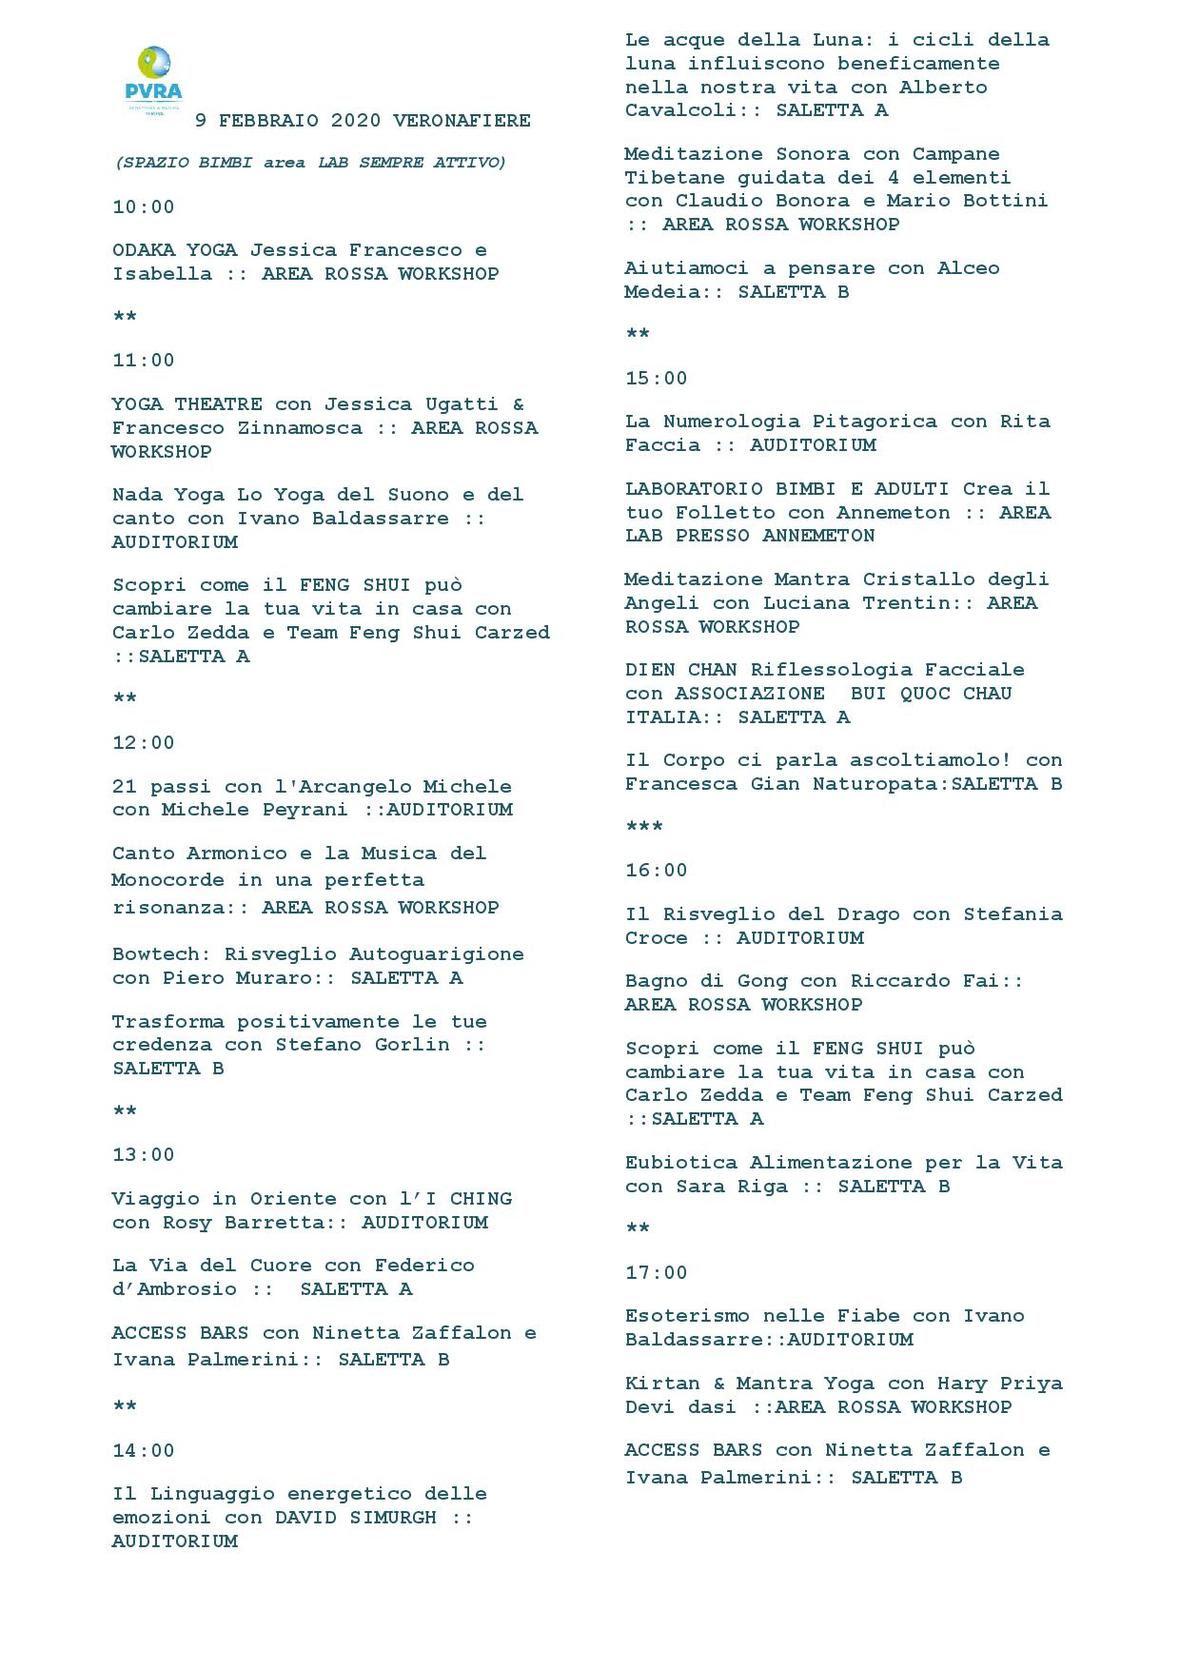 9 FEBBRAIO 2020 VERONAFIERE PROGRAMMA COMPLETO-page-001 1